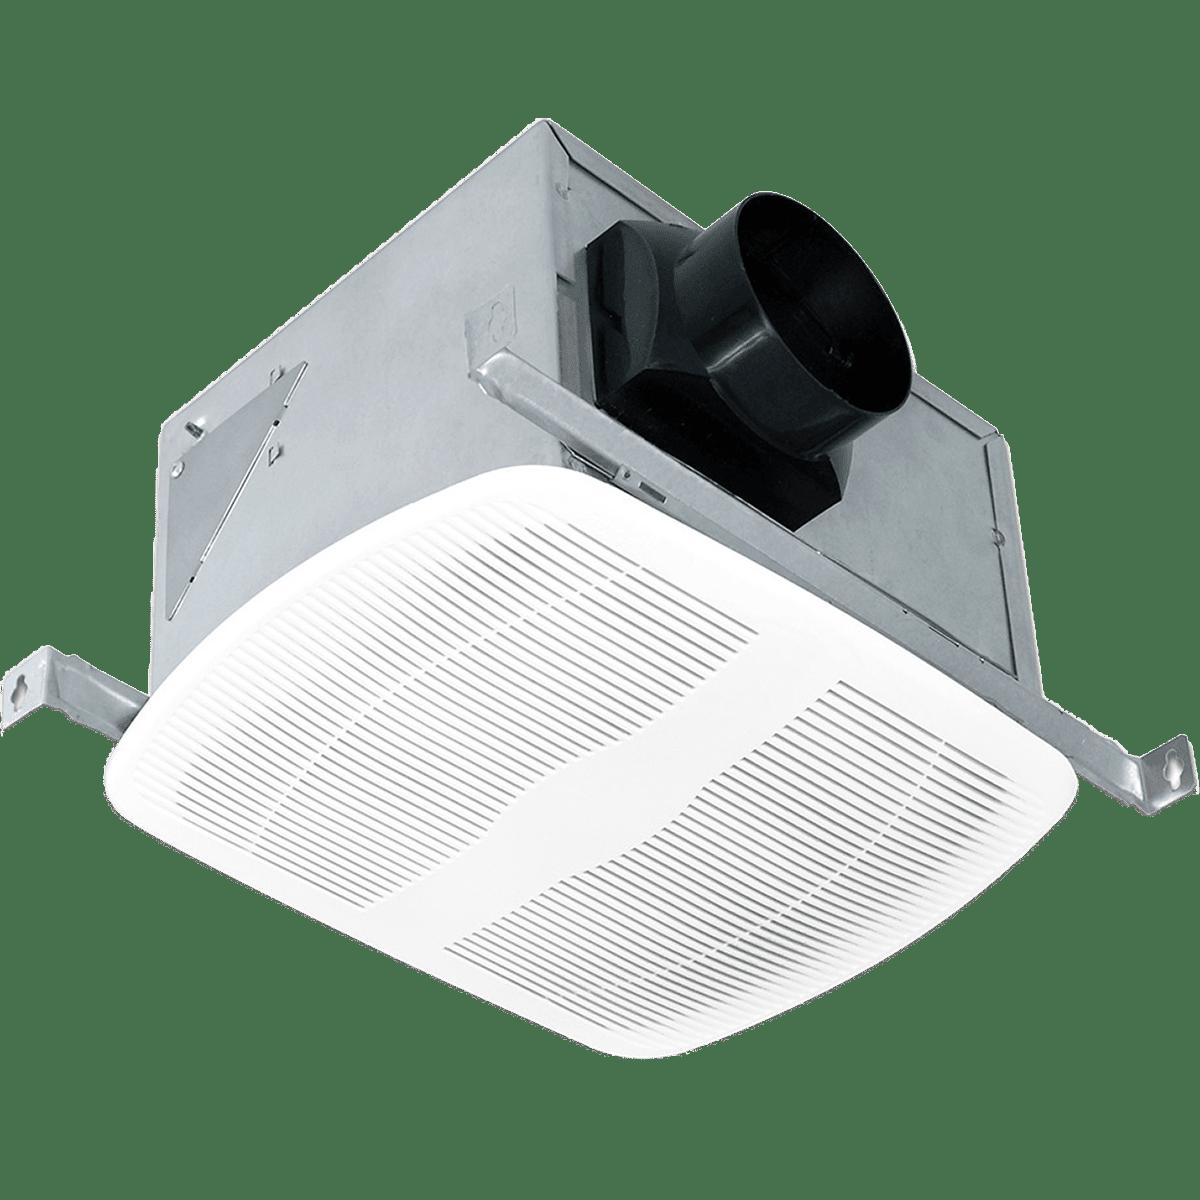 Air King Humidity Sensing Exhaust Fan Series